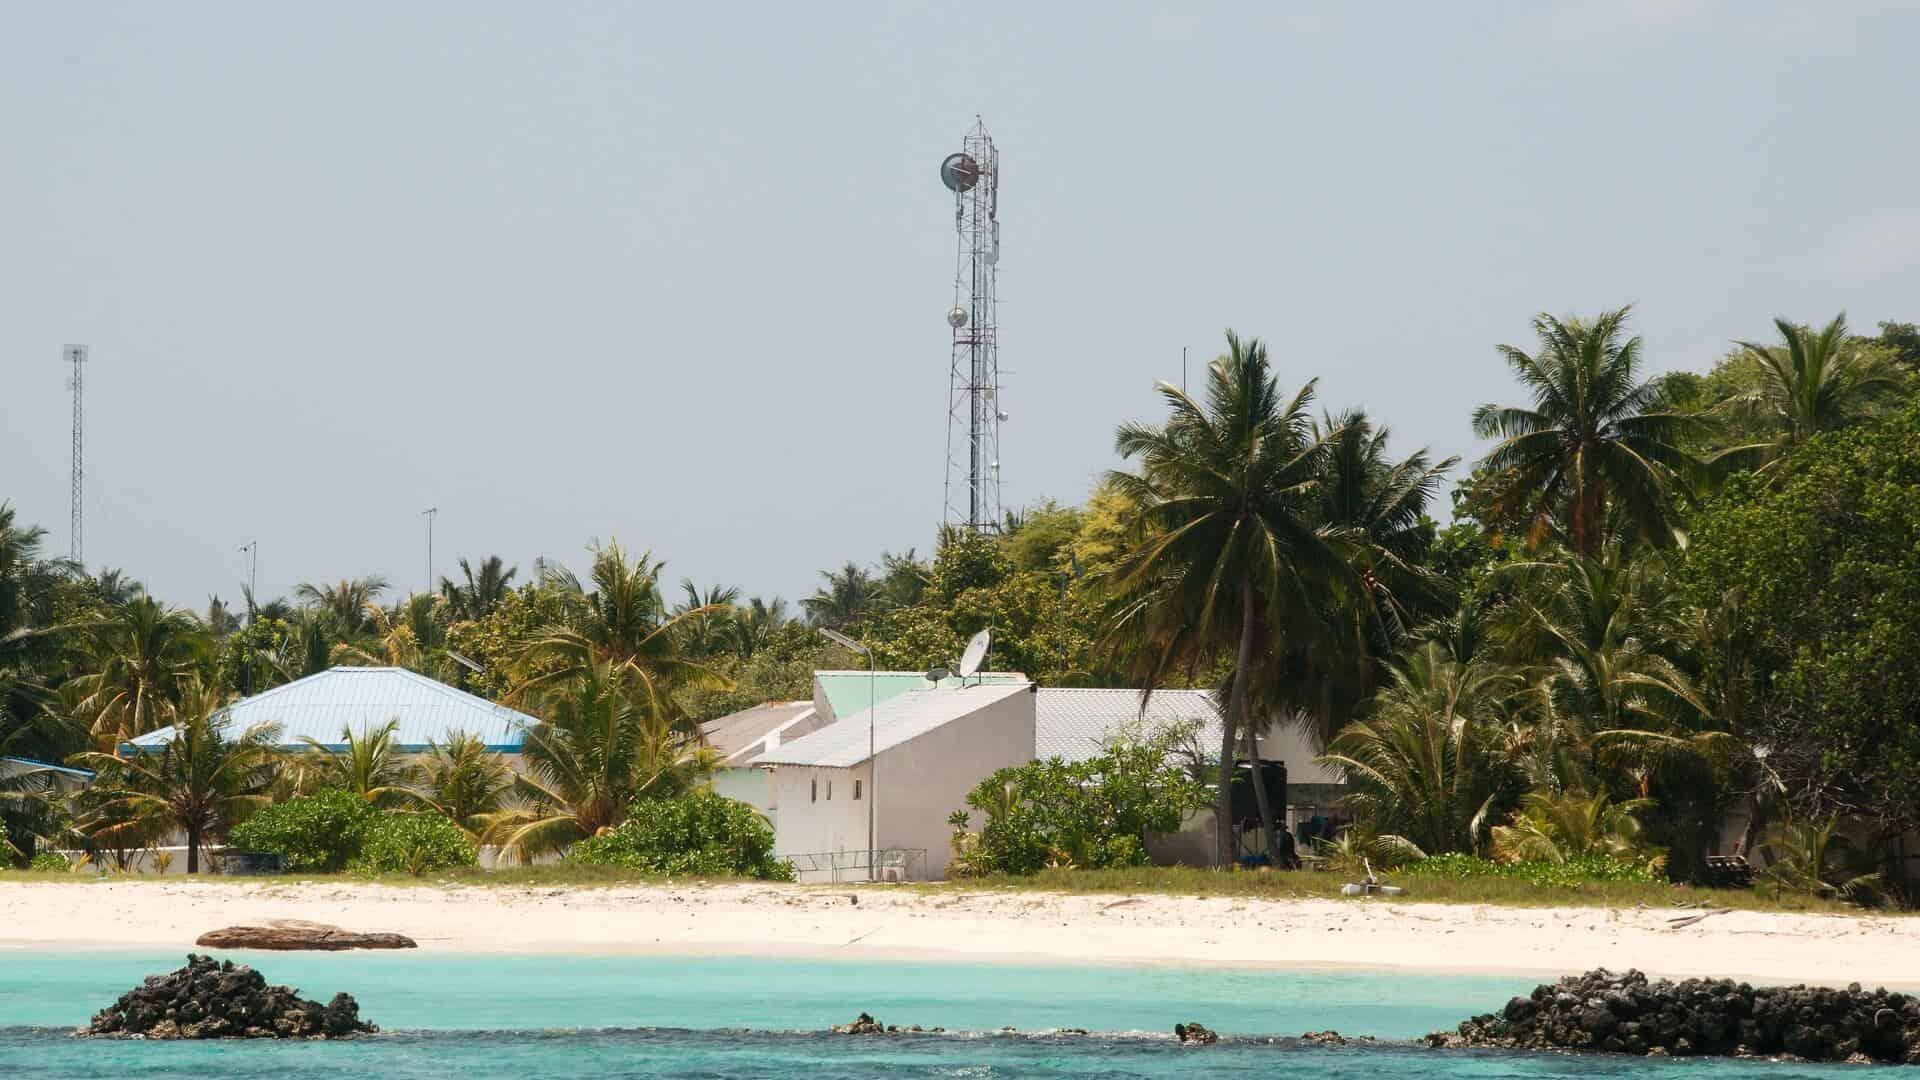 Maldives mobile communication